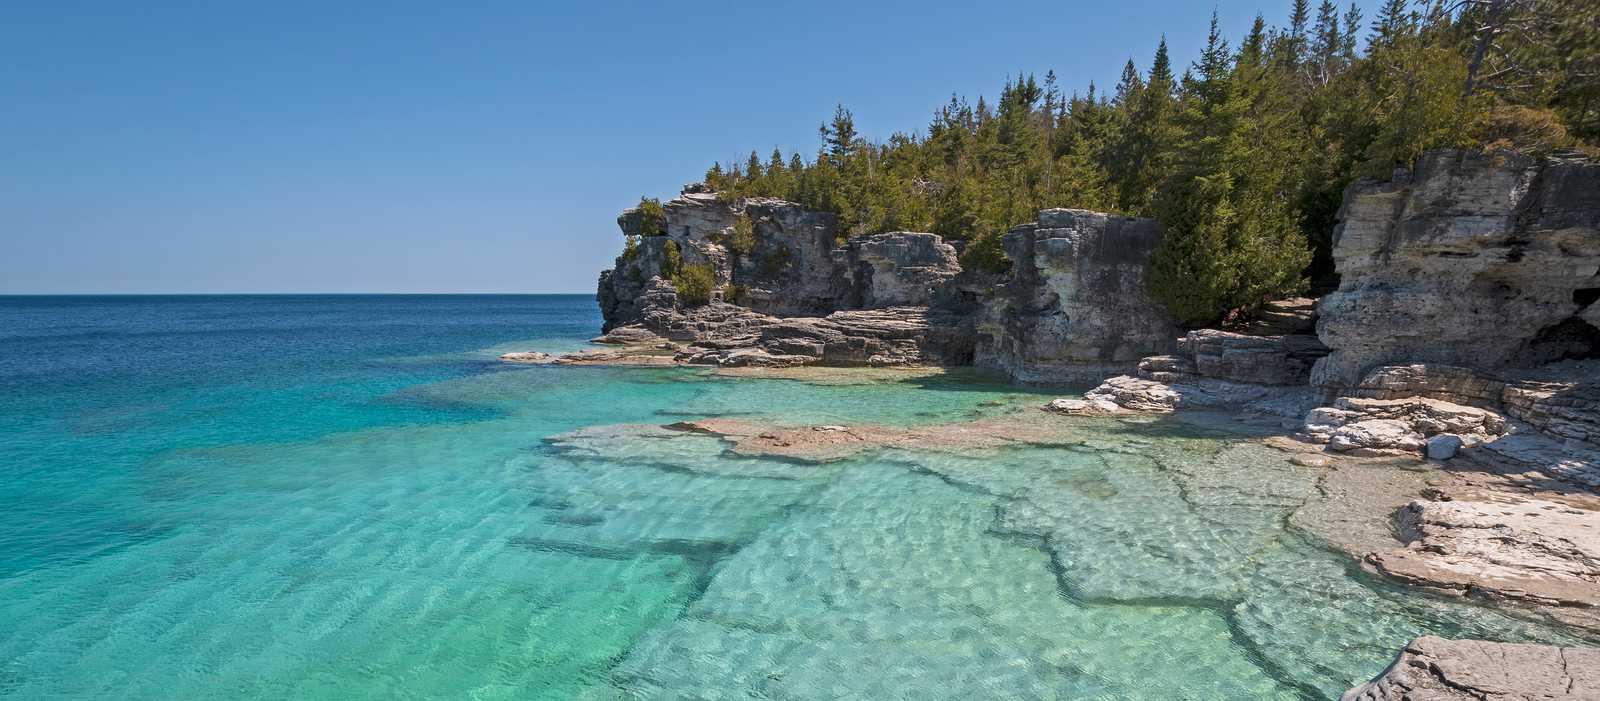 Blick auf Lake Huron im Bruce Peninsula National Park, Ontario